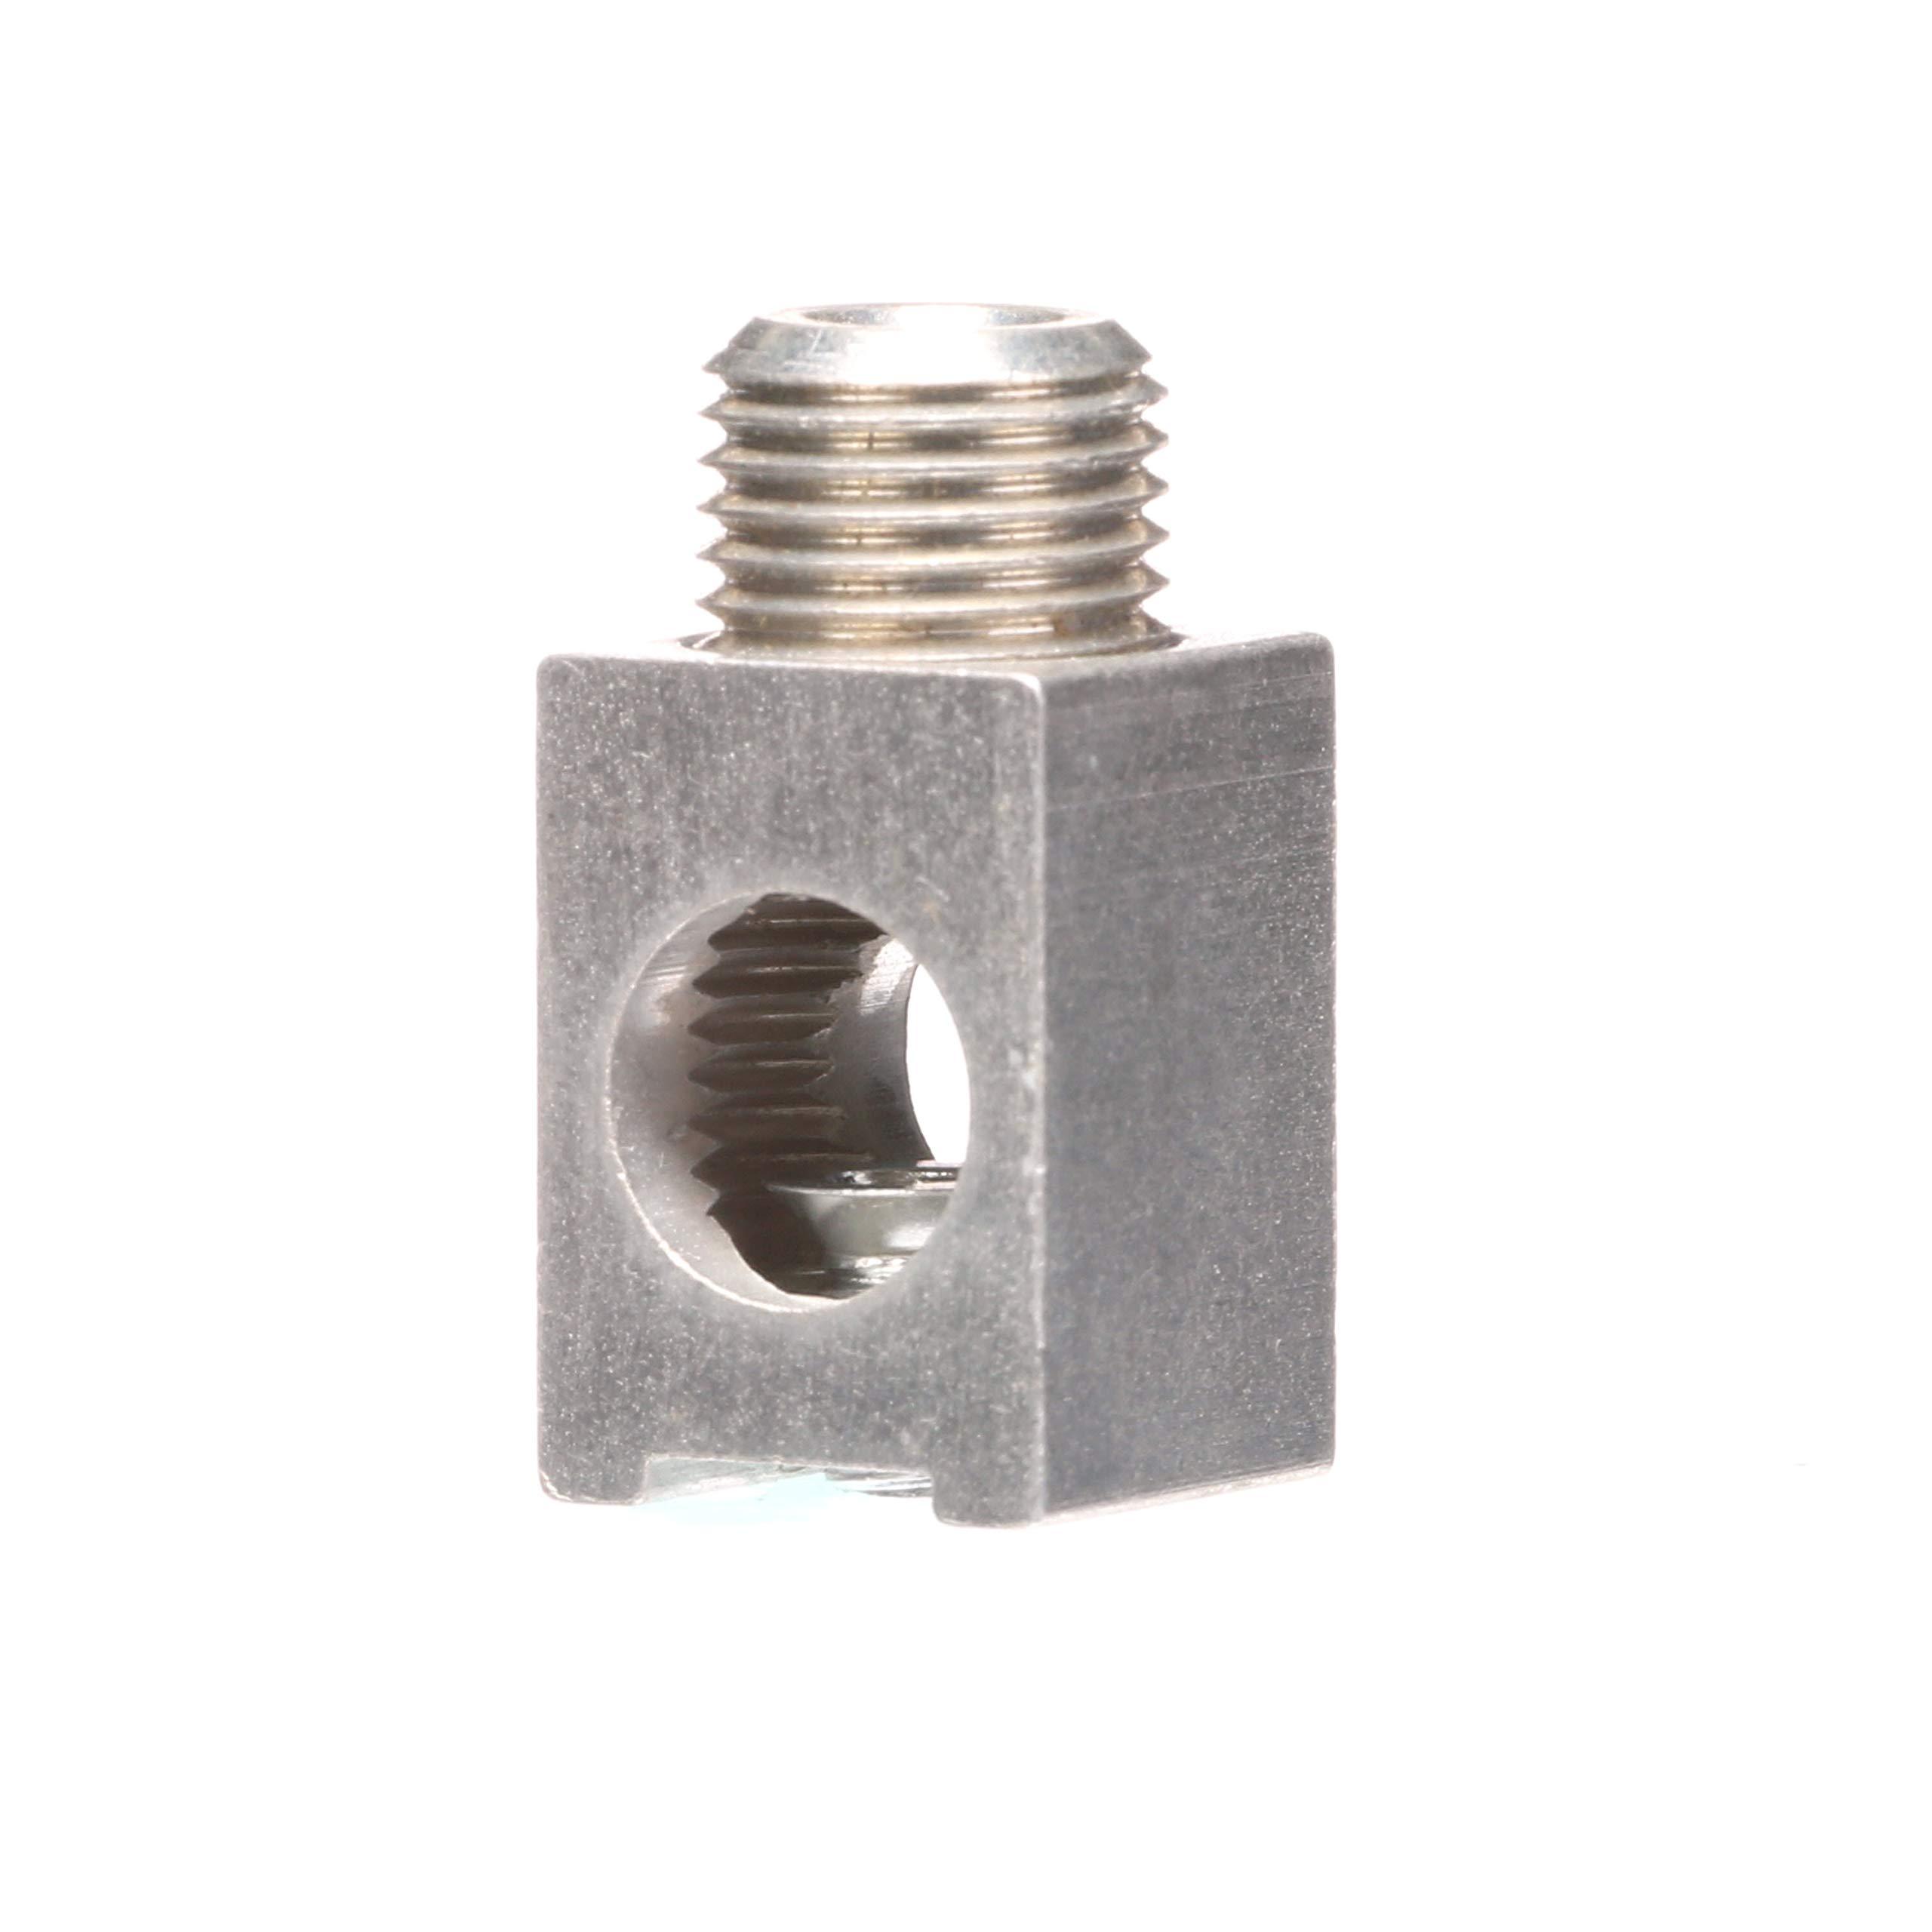 SIEMENS ECLK2#4-2/0 Neutral Lug Kit, COLOR